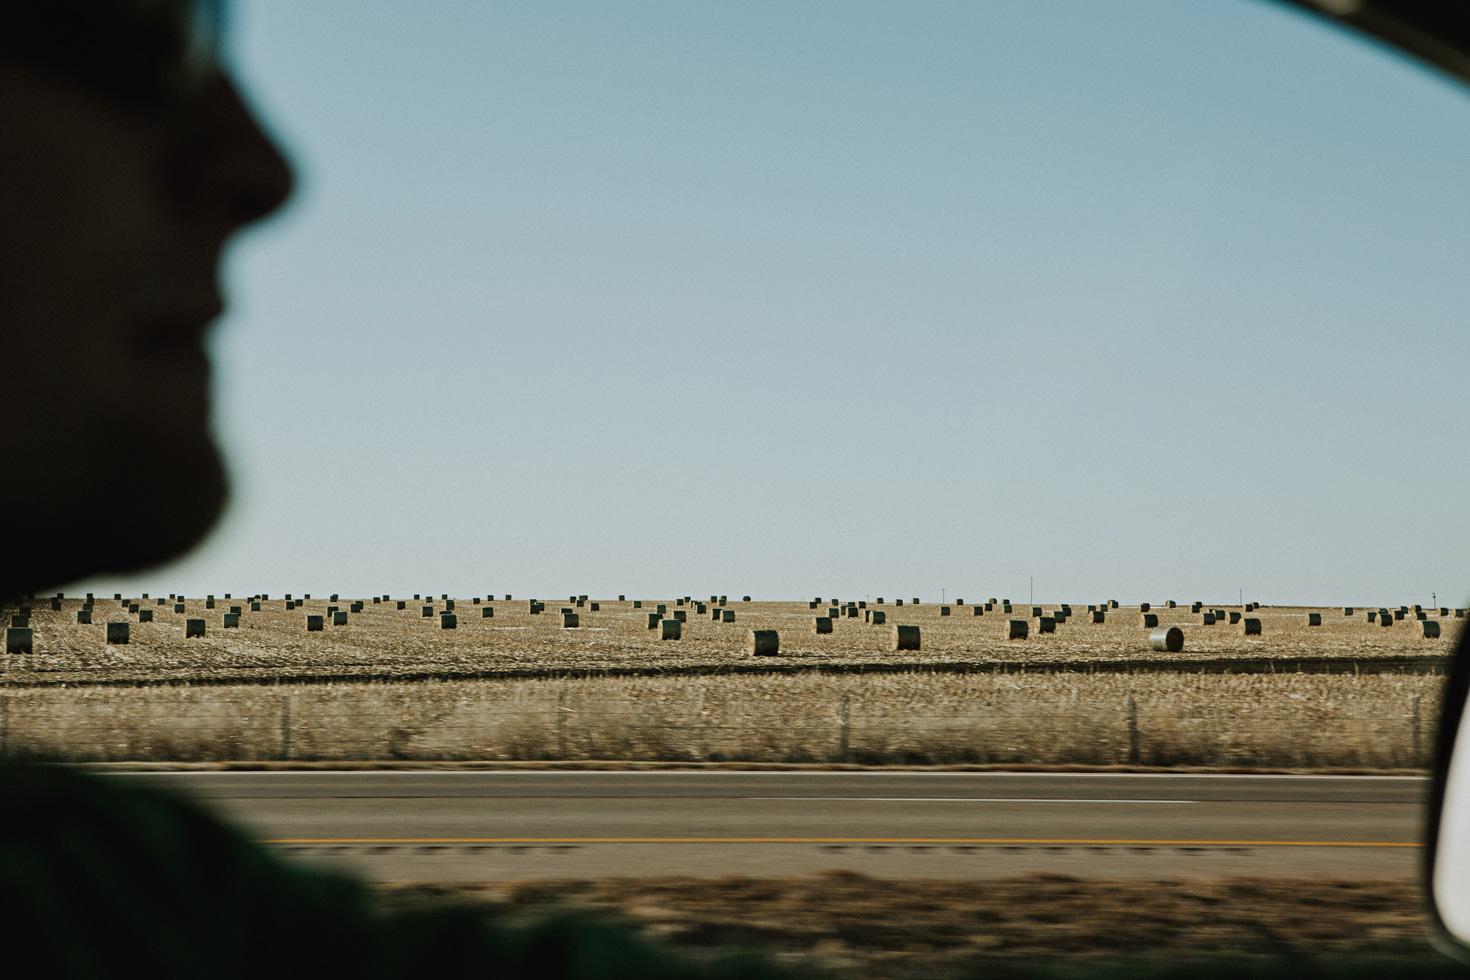 CindyGiovagnoli_Great_Sand_Dunes_National_Park_NPS_Colorado_roadtrip-002.jpg